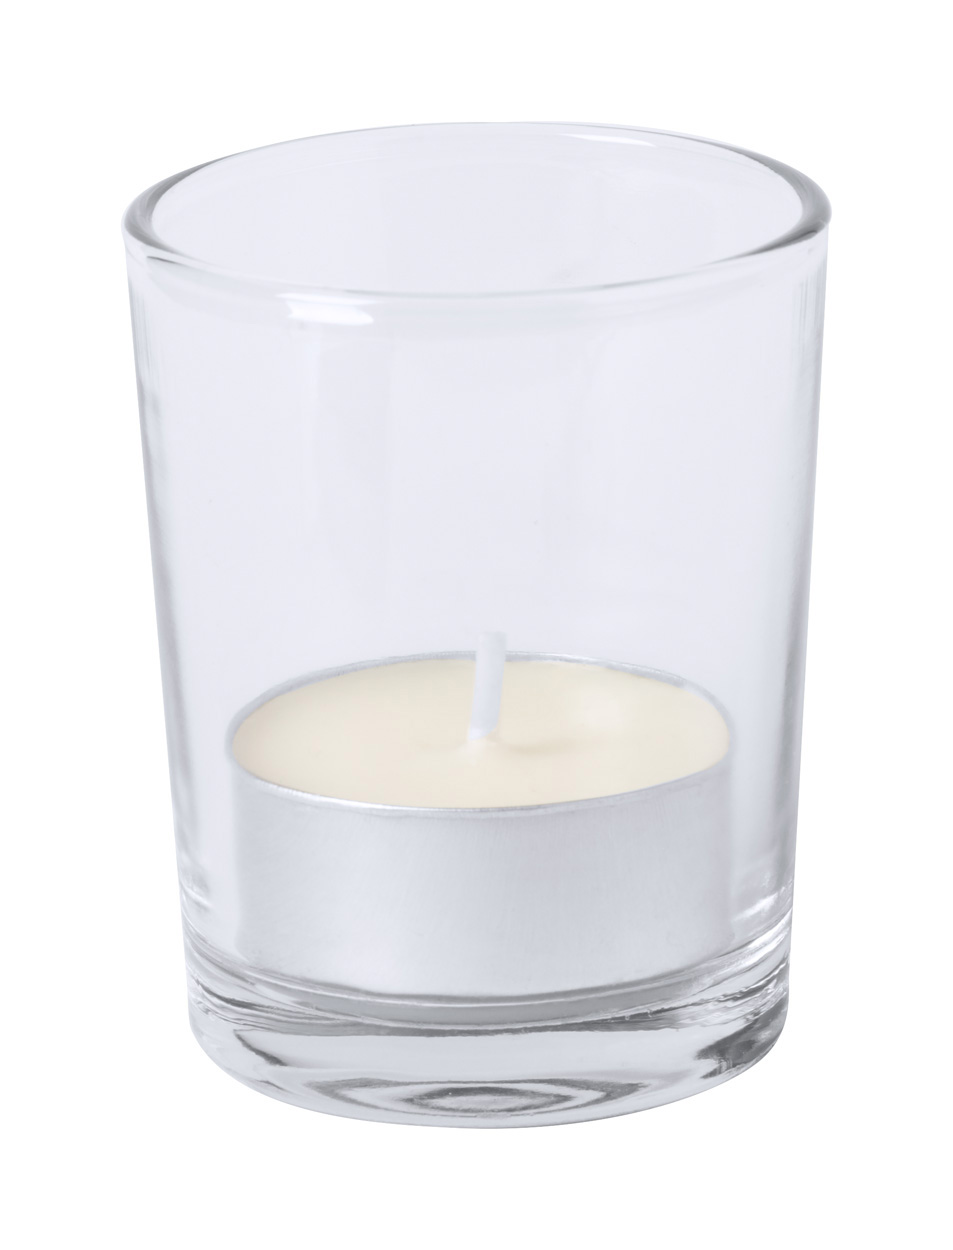 fehér Persy gyertya